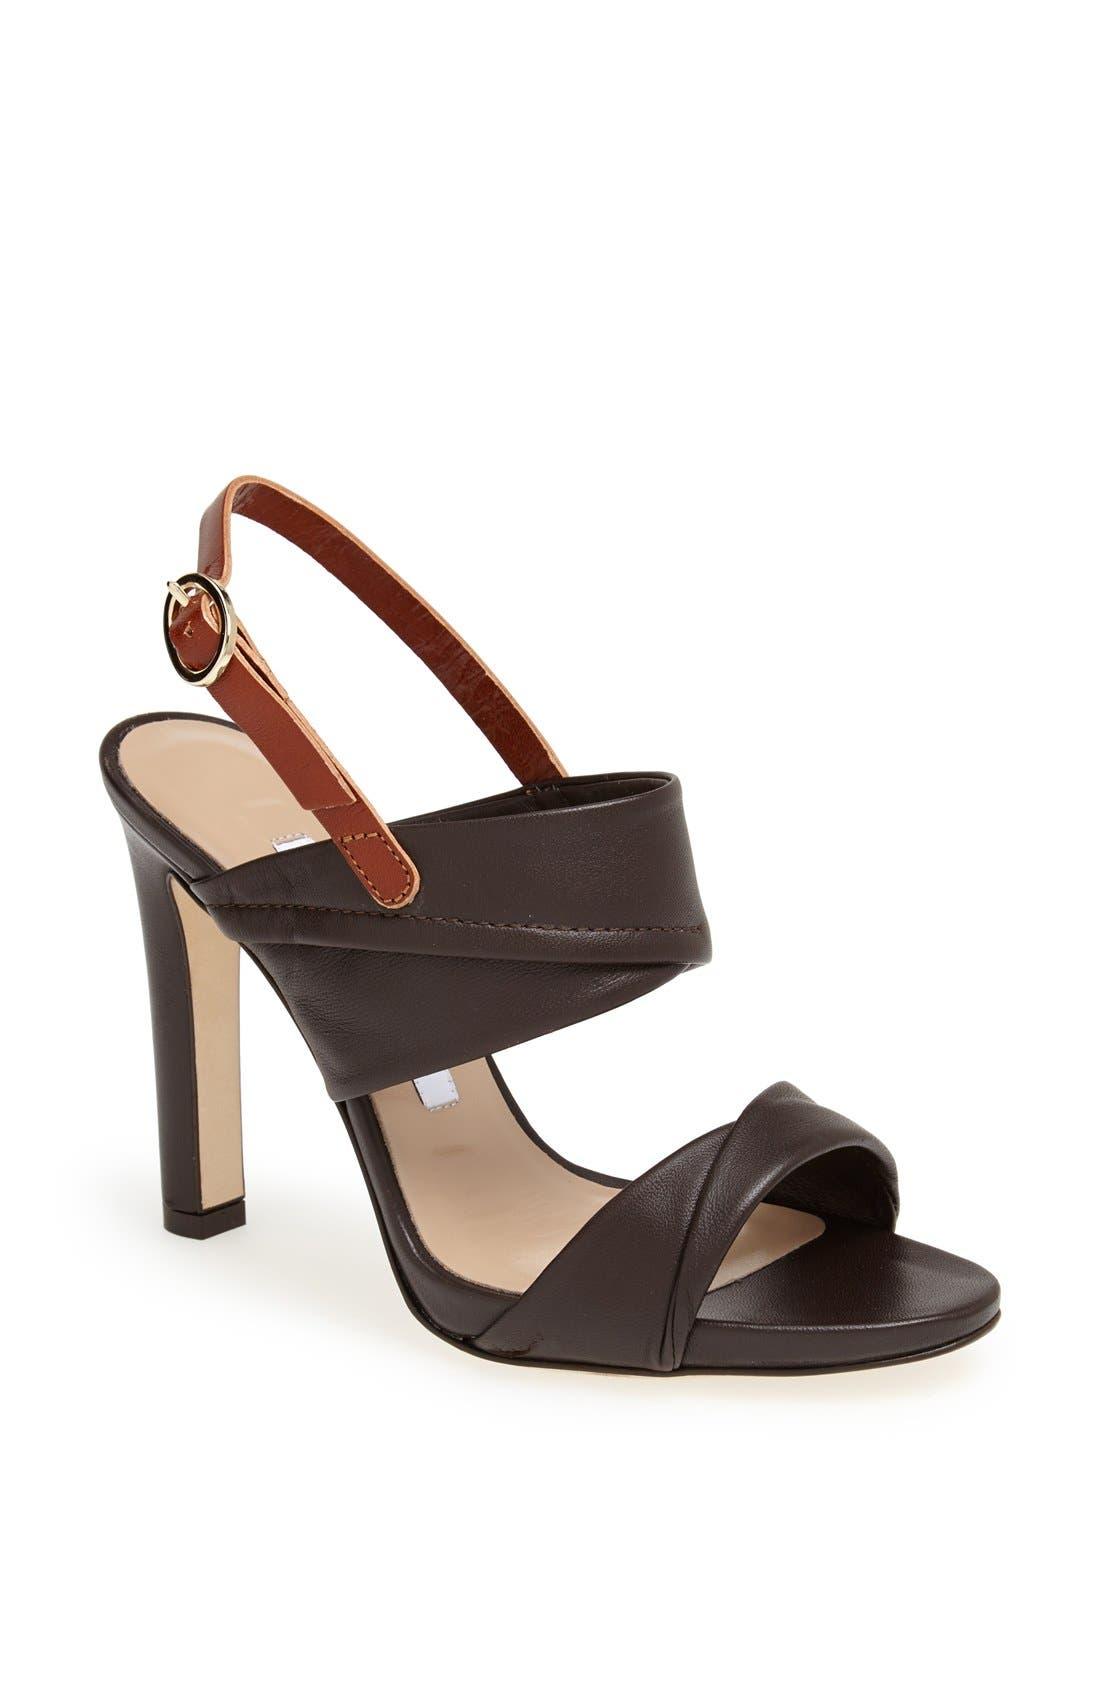 Main Image - Diane von Furstenberg 'Jacey' Leather Sandal